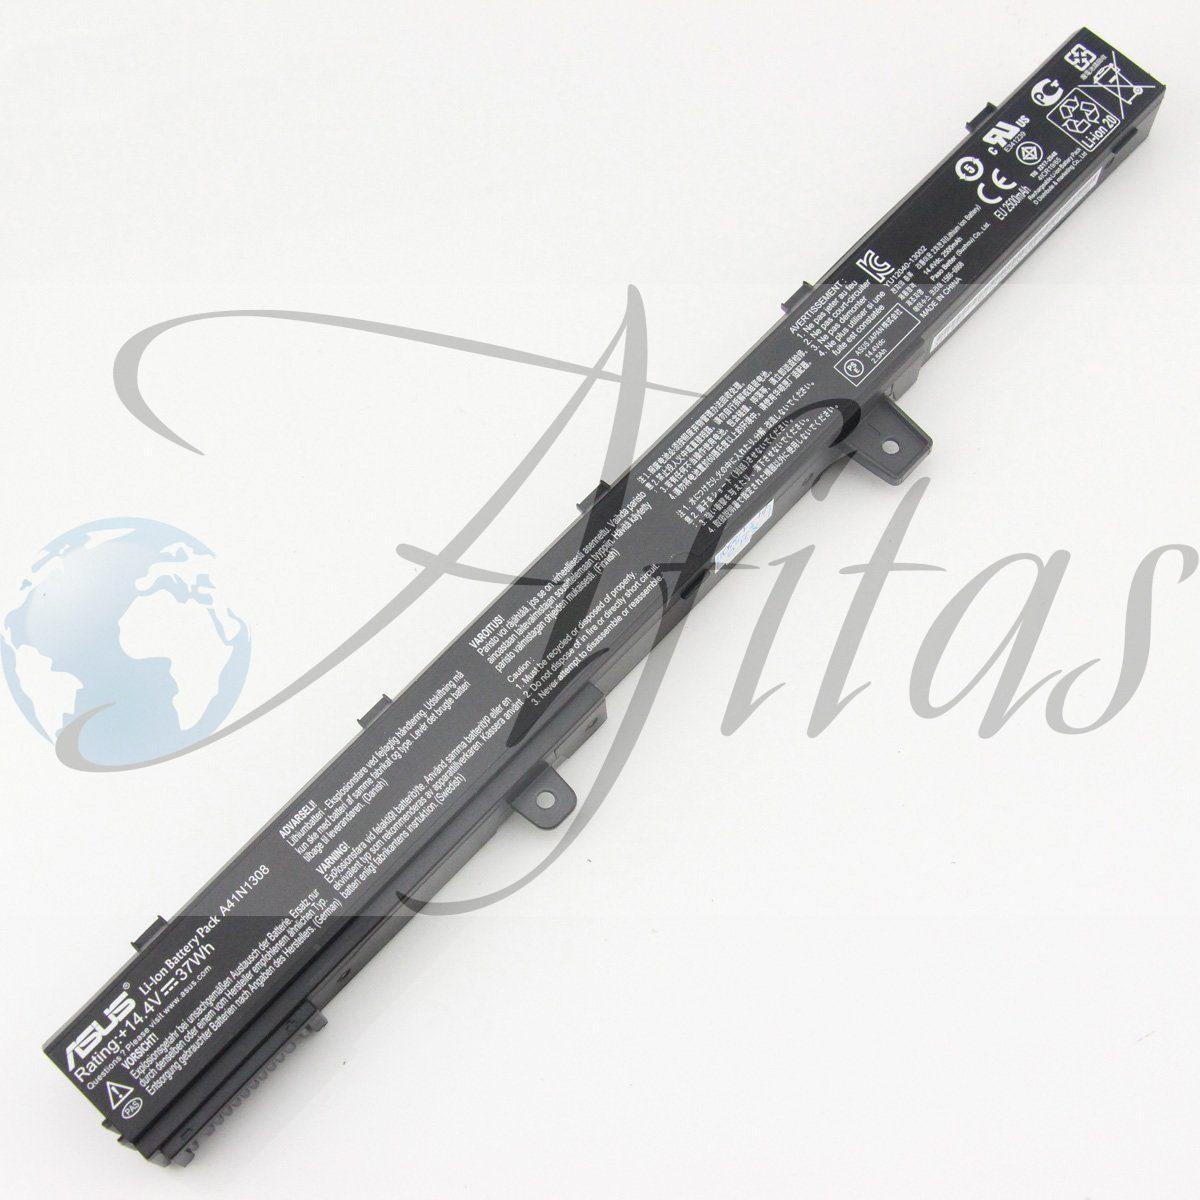 Asus kompiuterio baterija X551ACA X551 X451C